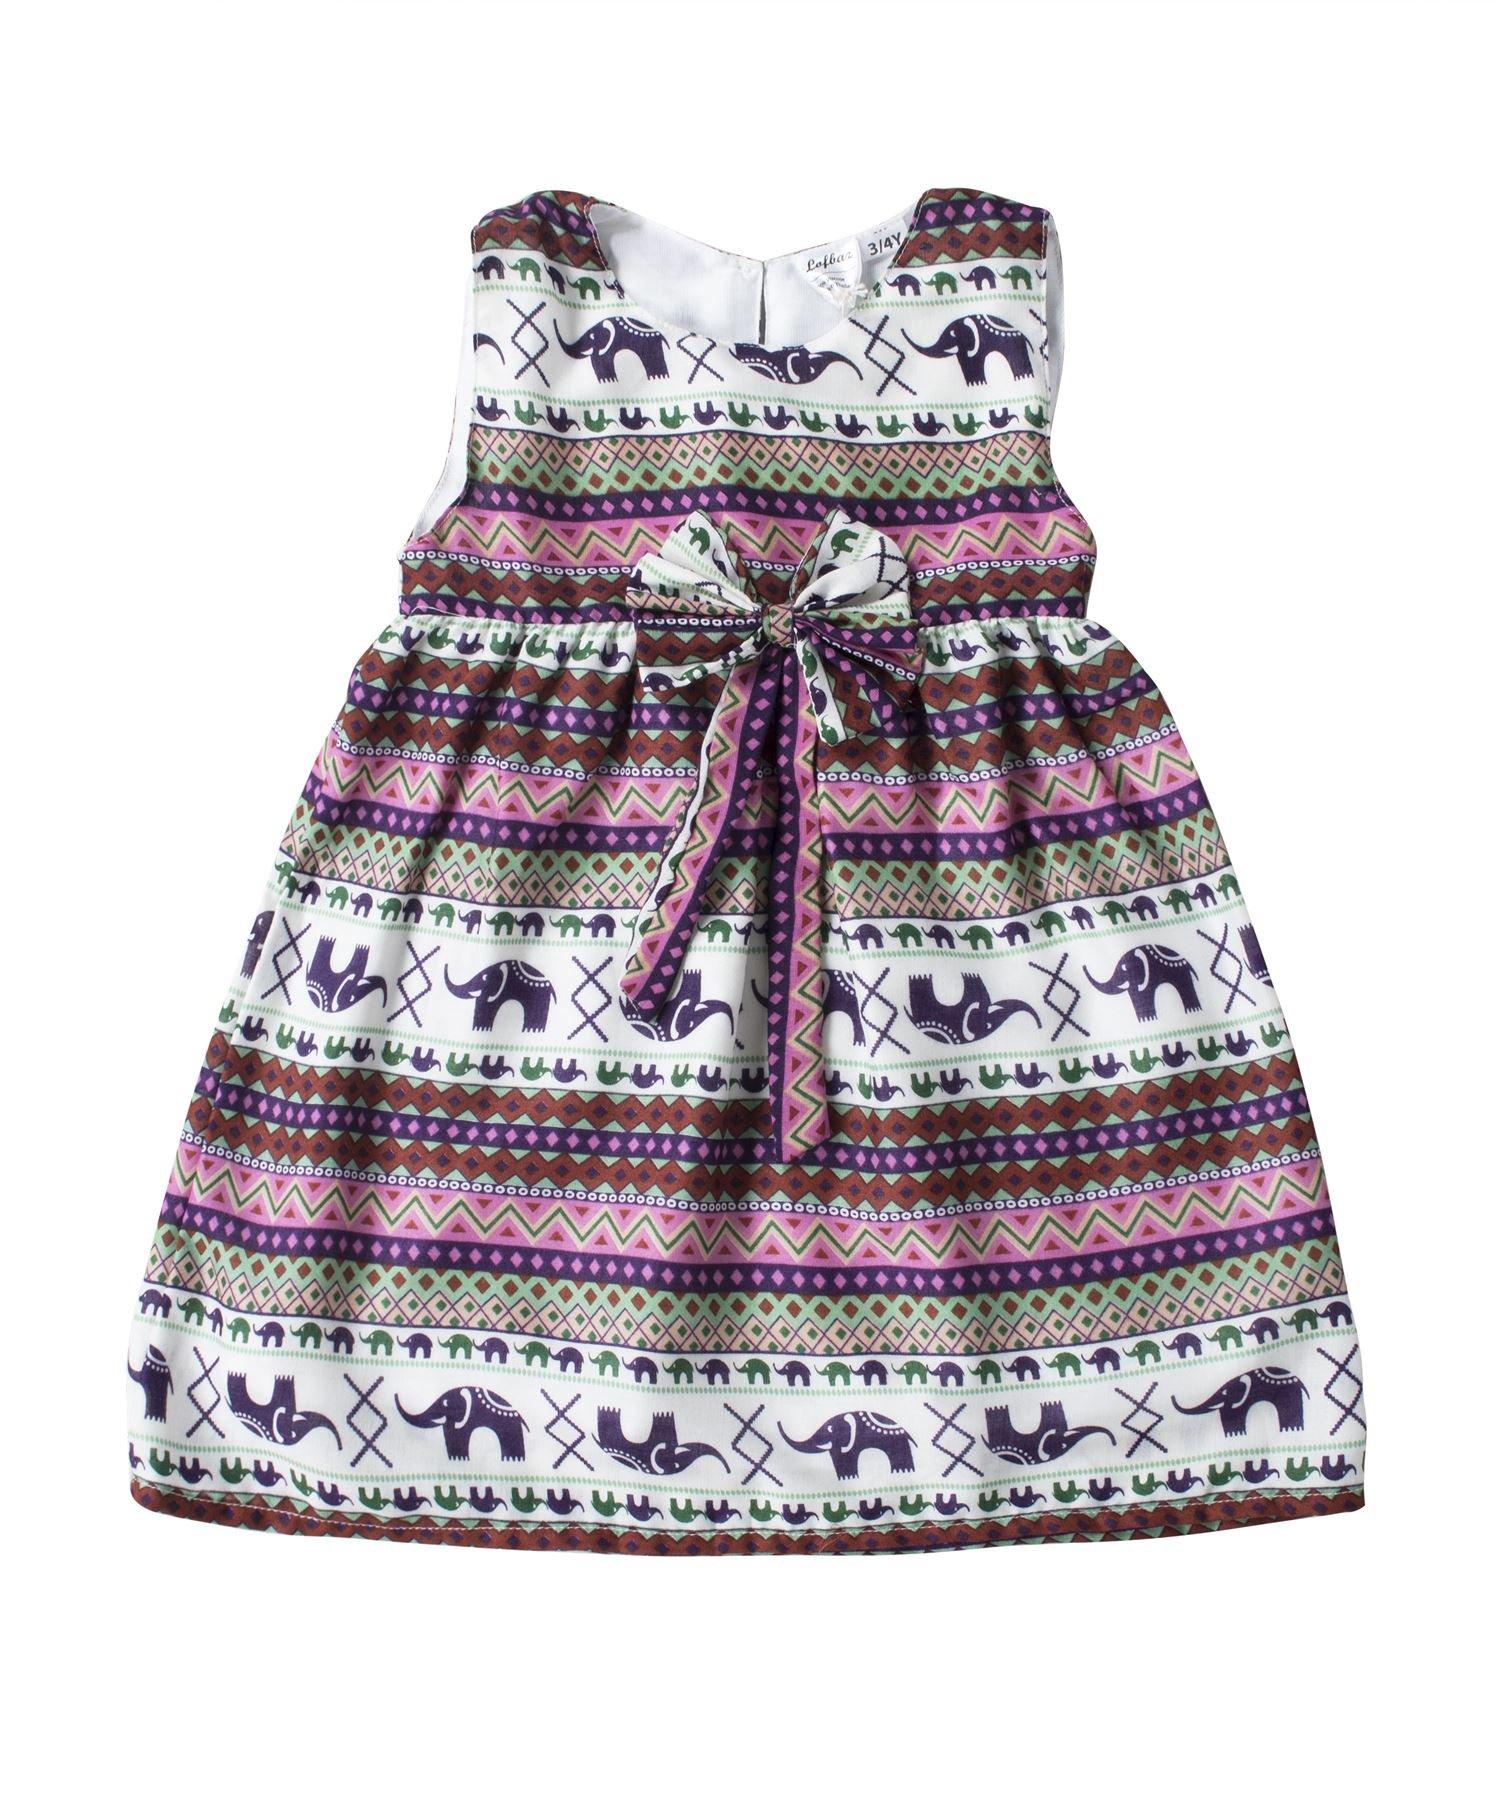 Lofbaz Girls Printed Rayon Sleeveless Tea Dresses - Elephant 16 Pink - 4-5Y